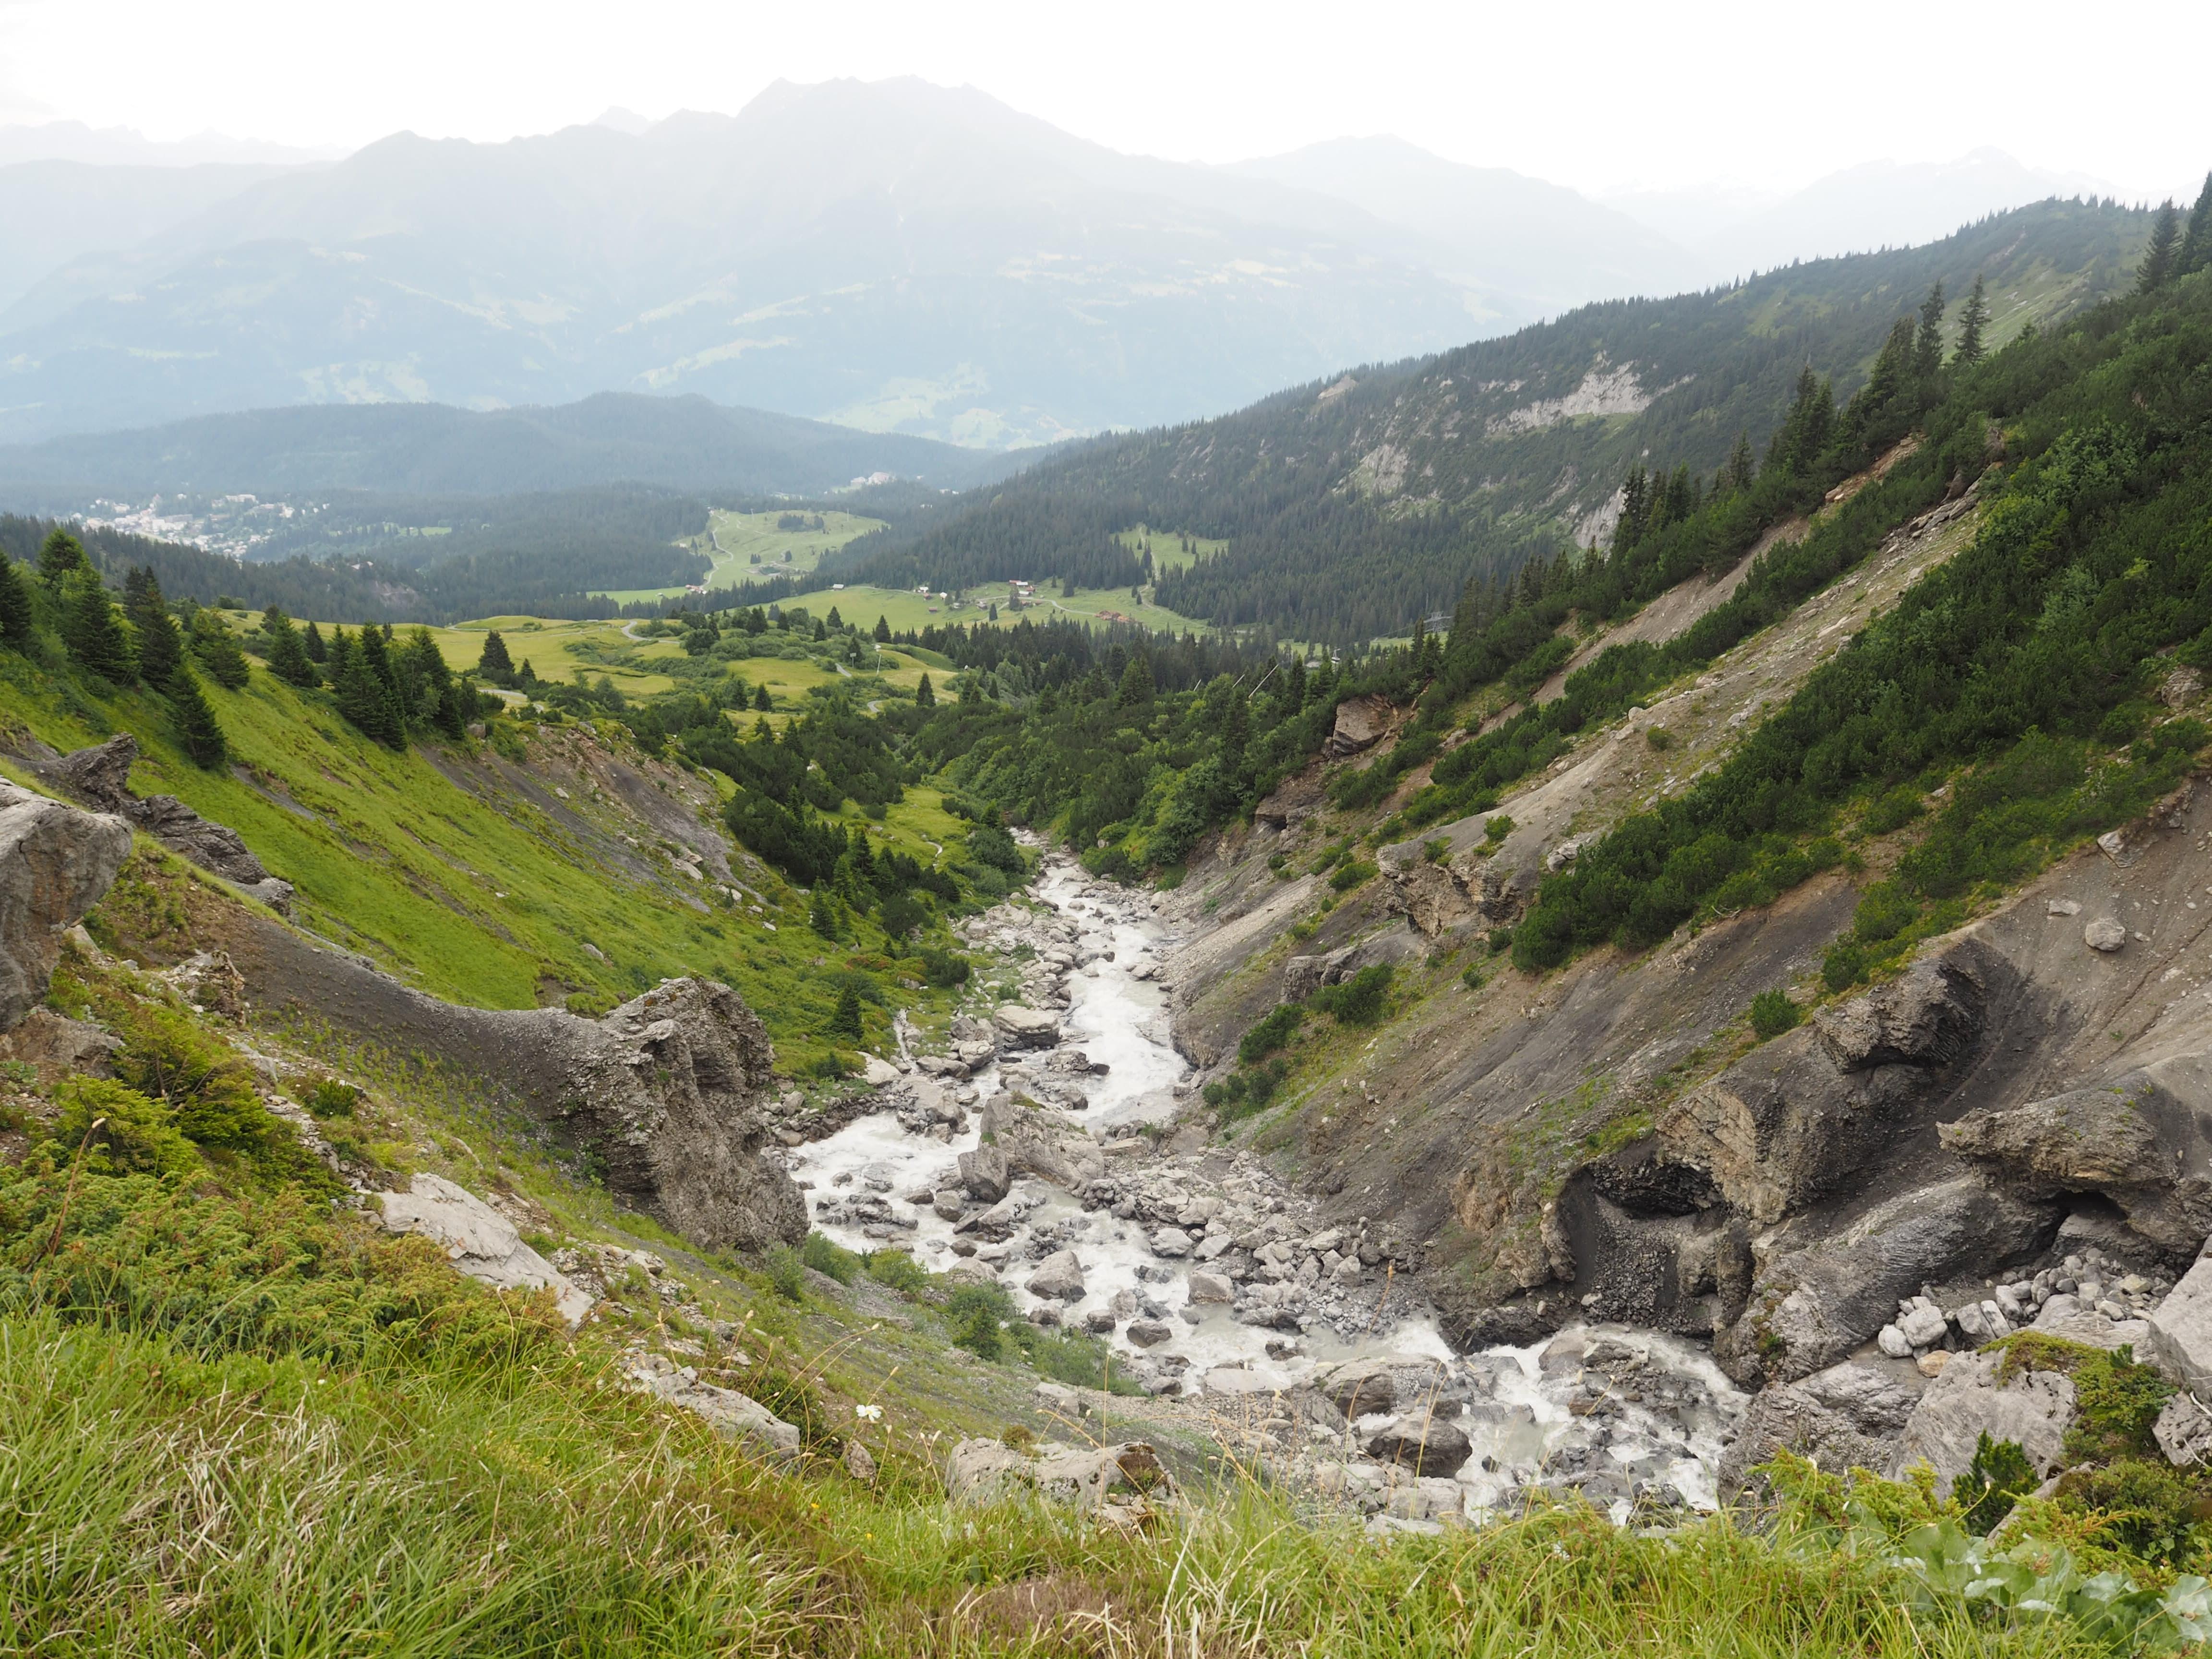 Summer in Flims watertrail TRUTG DI FLEM